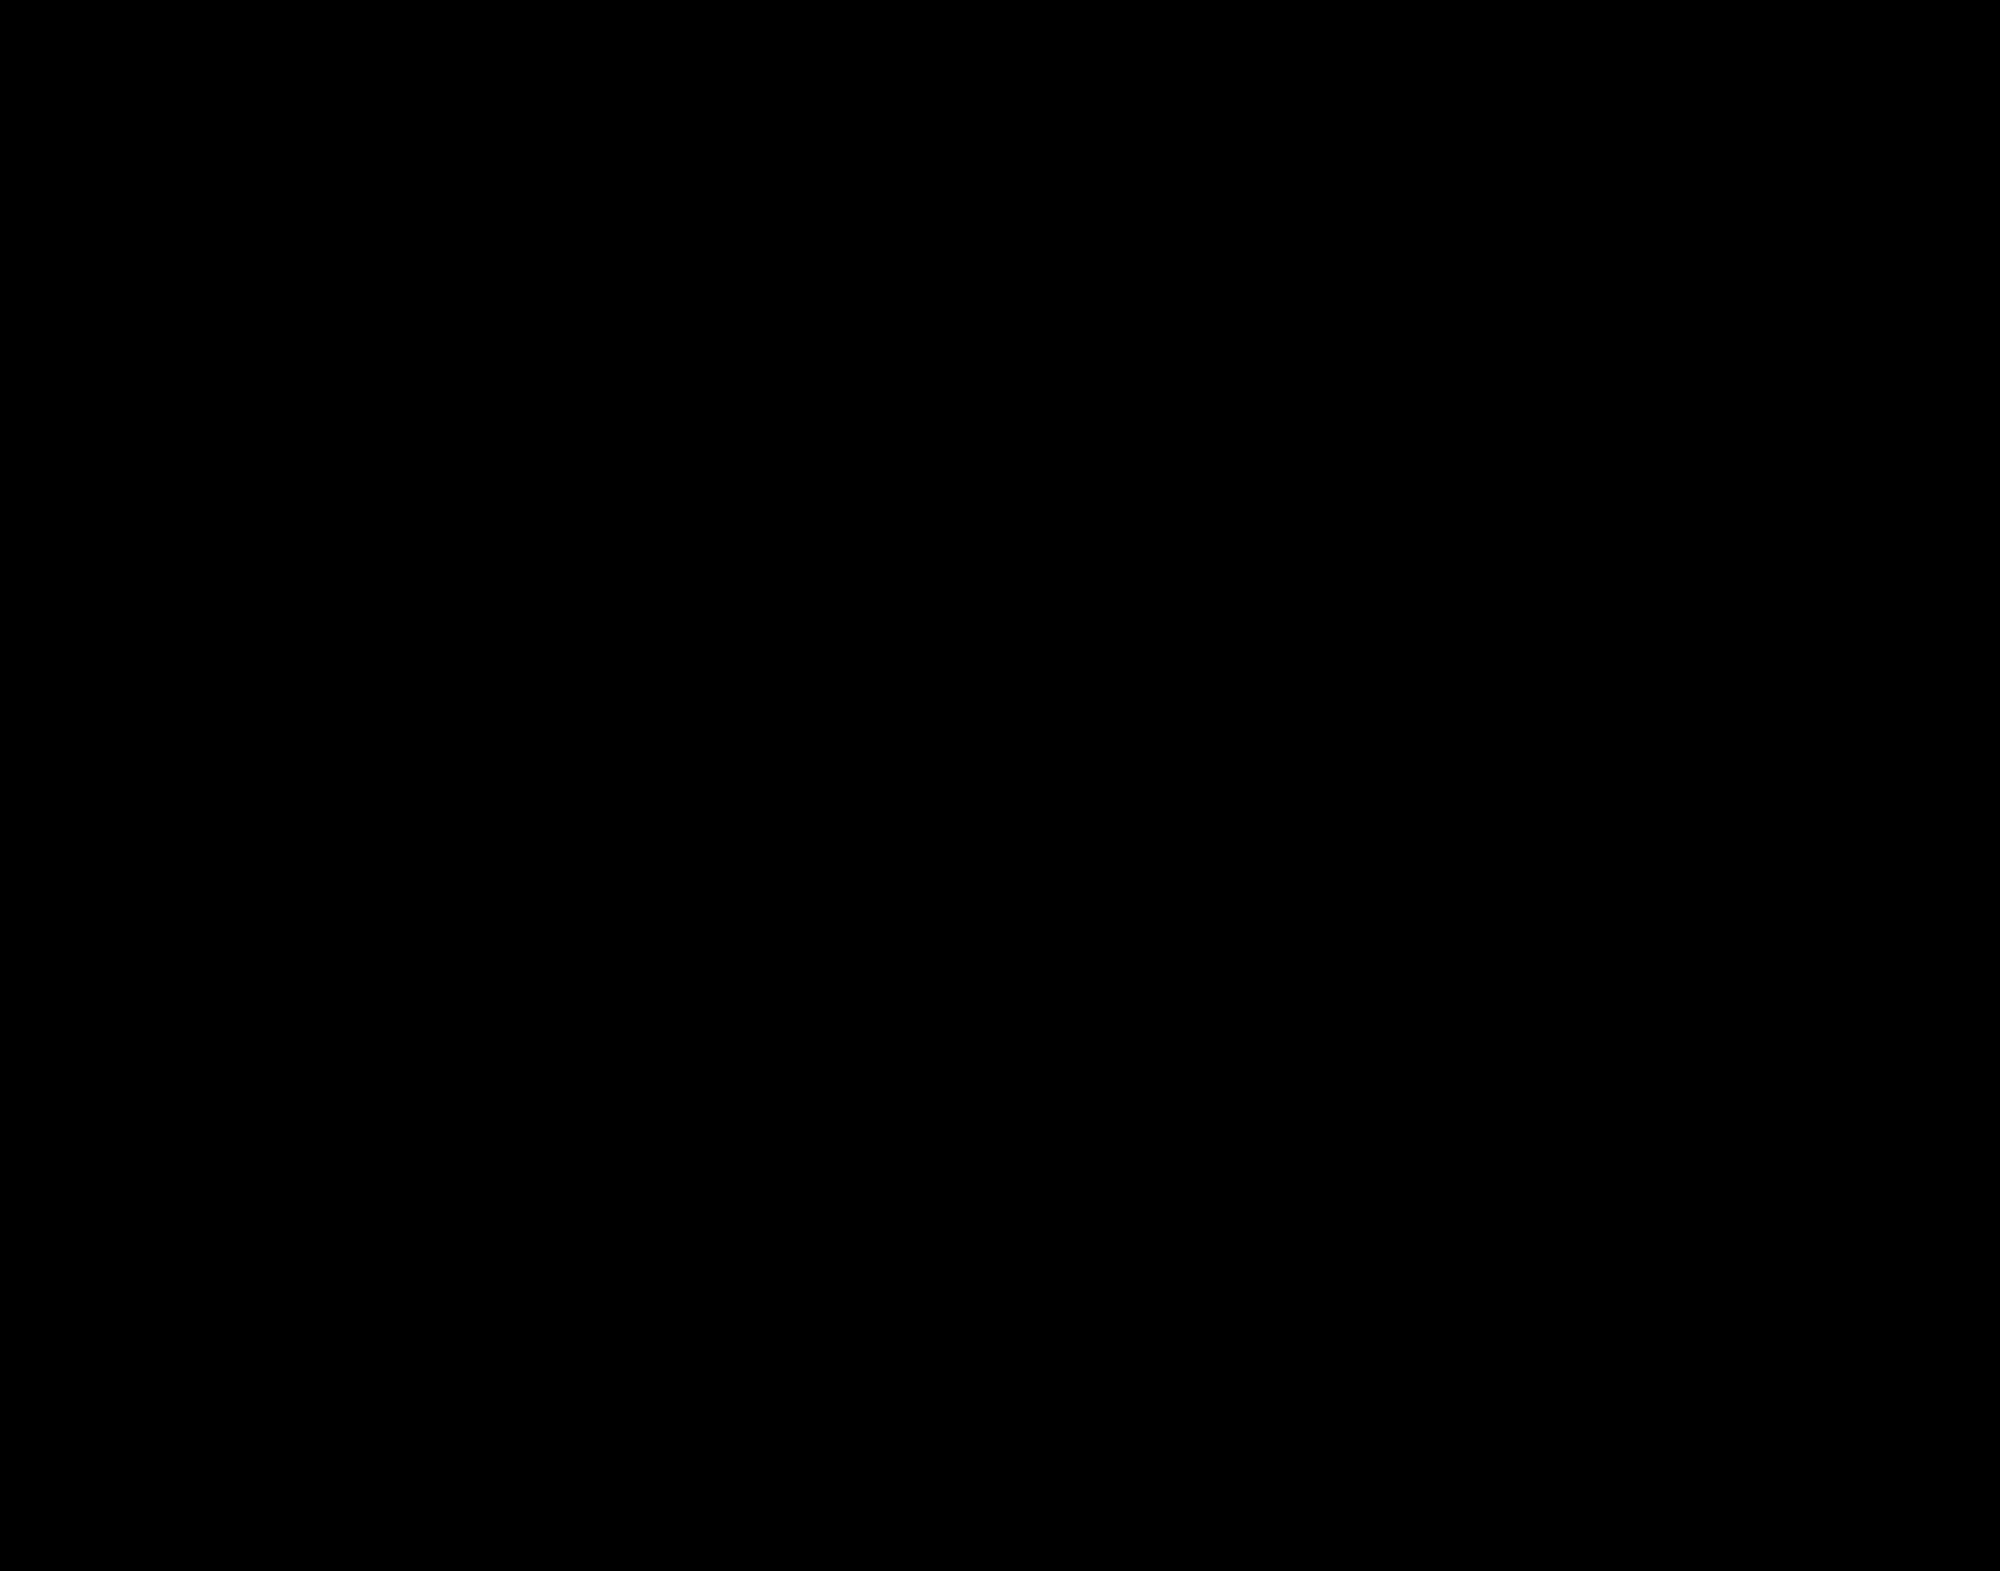 Hedgehog clipart svg. File comadreja wikimedia commons